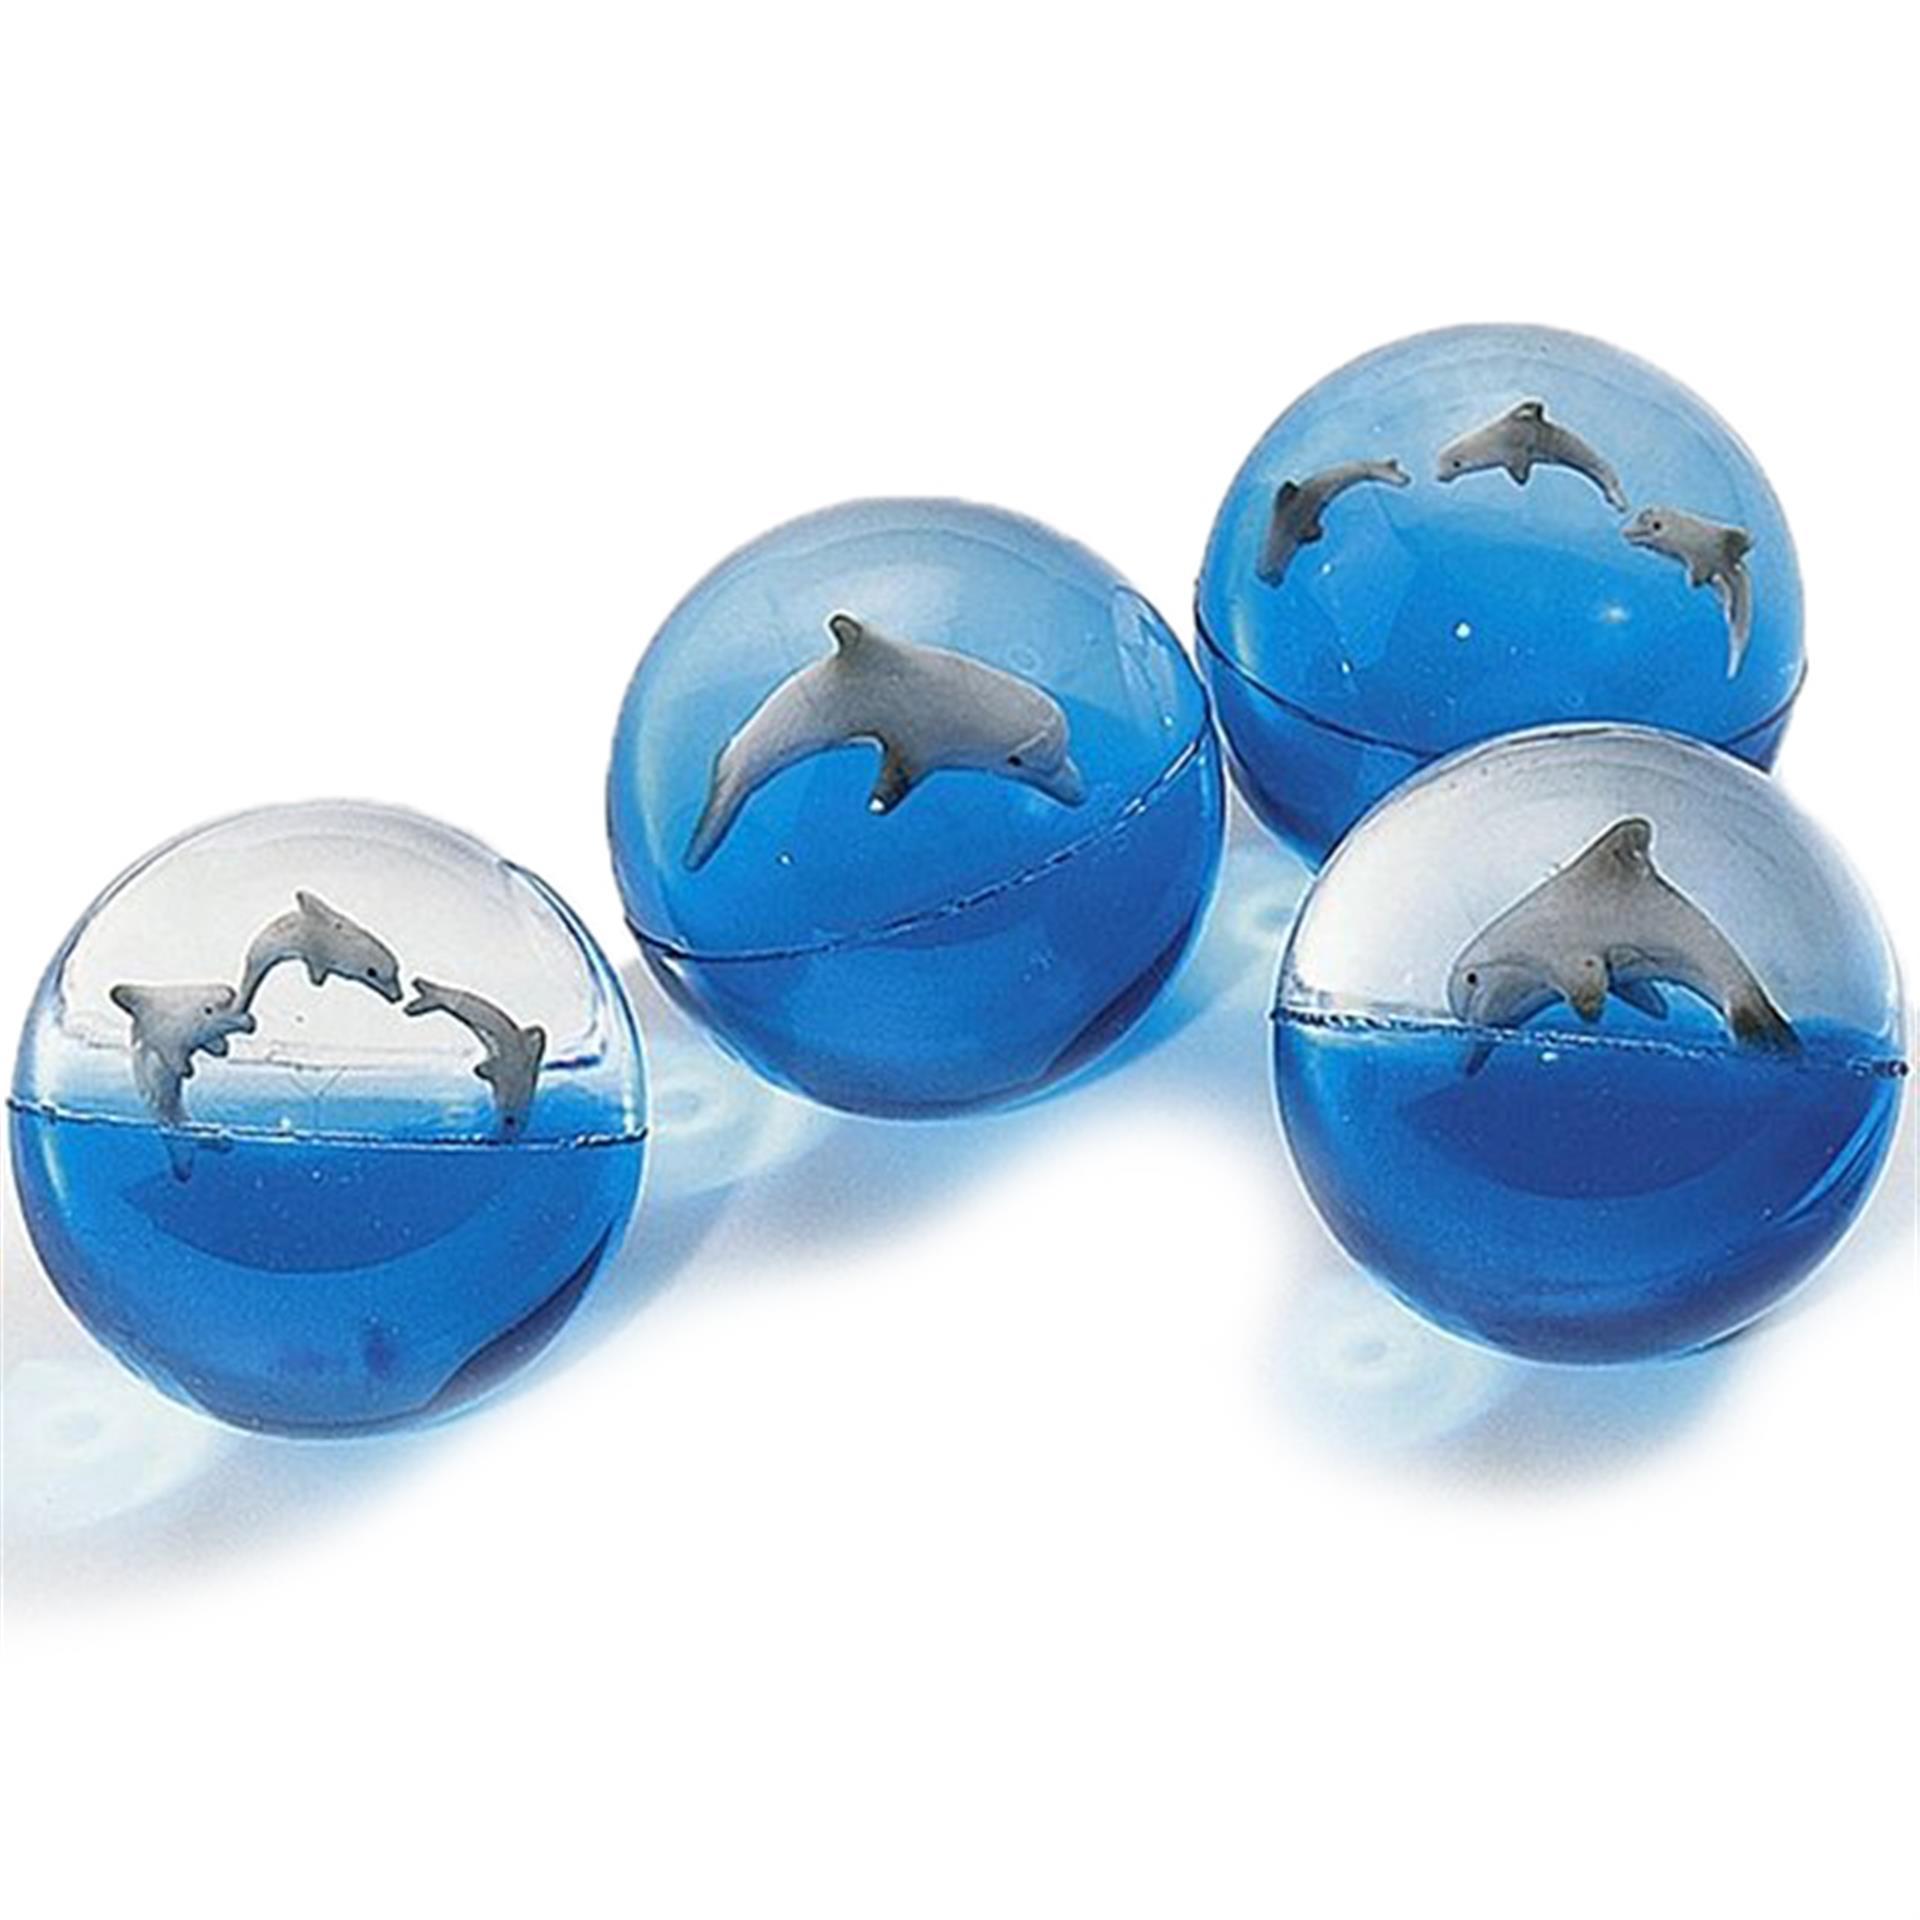 Springbälle Oeko Set Delfin 4tlg.